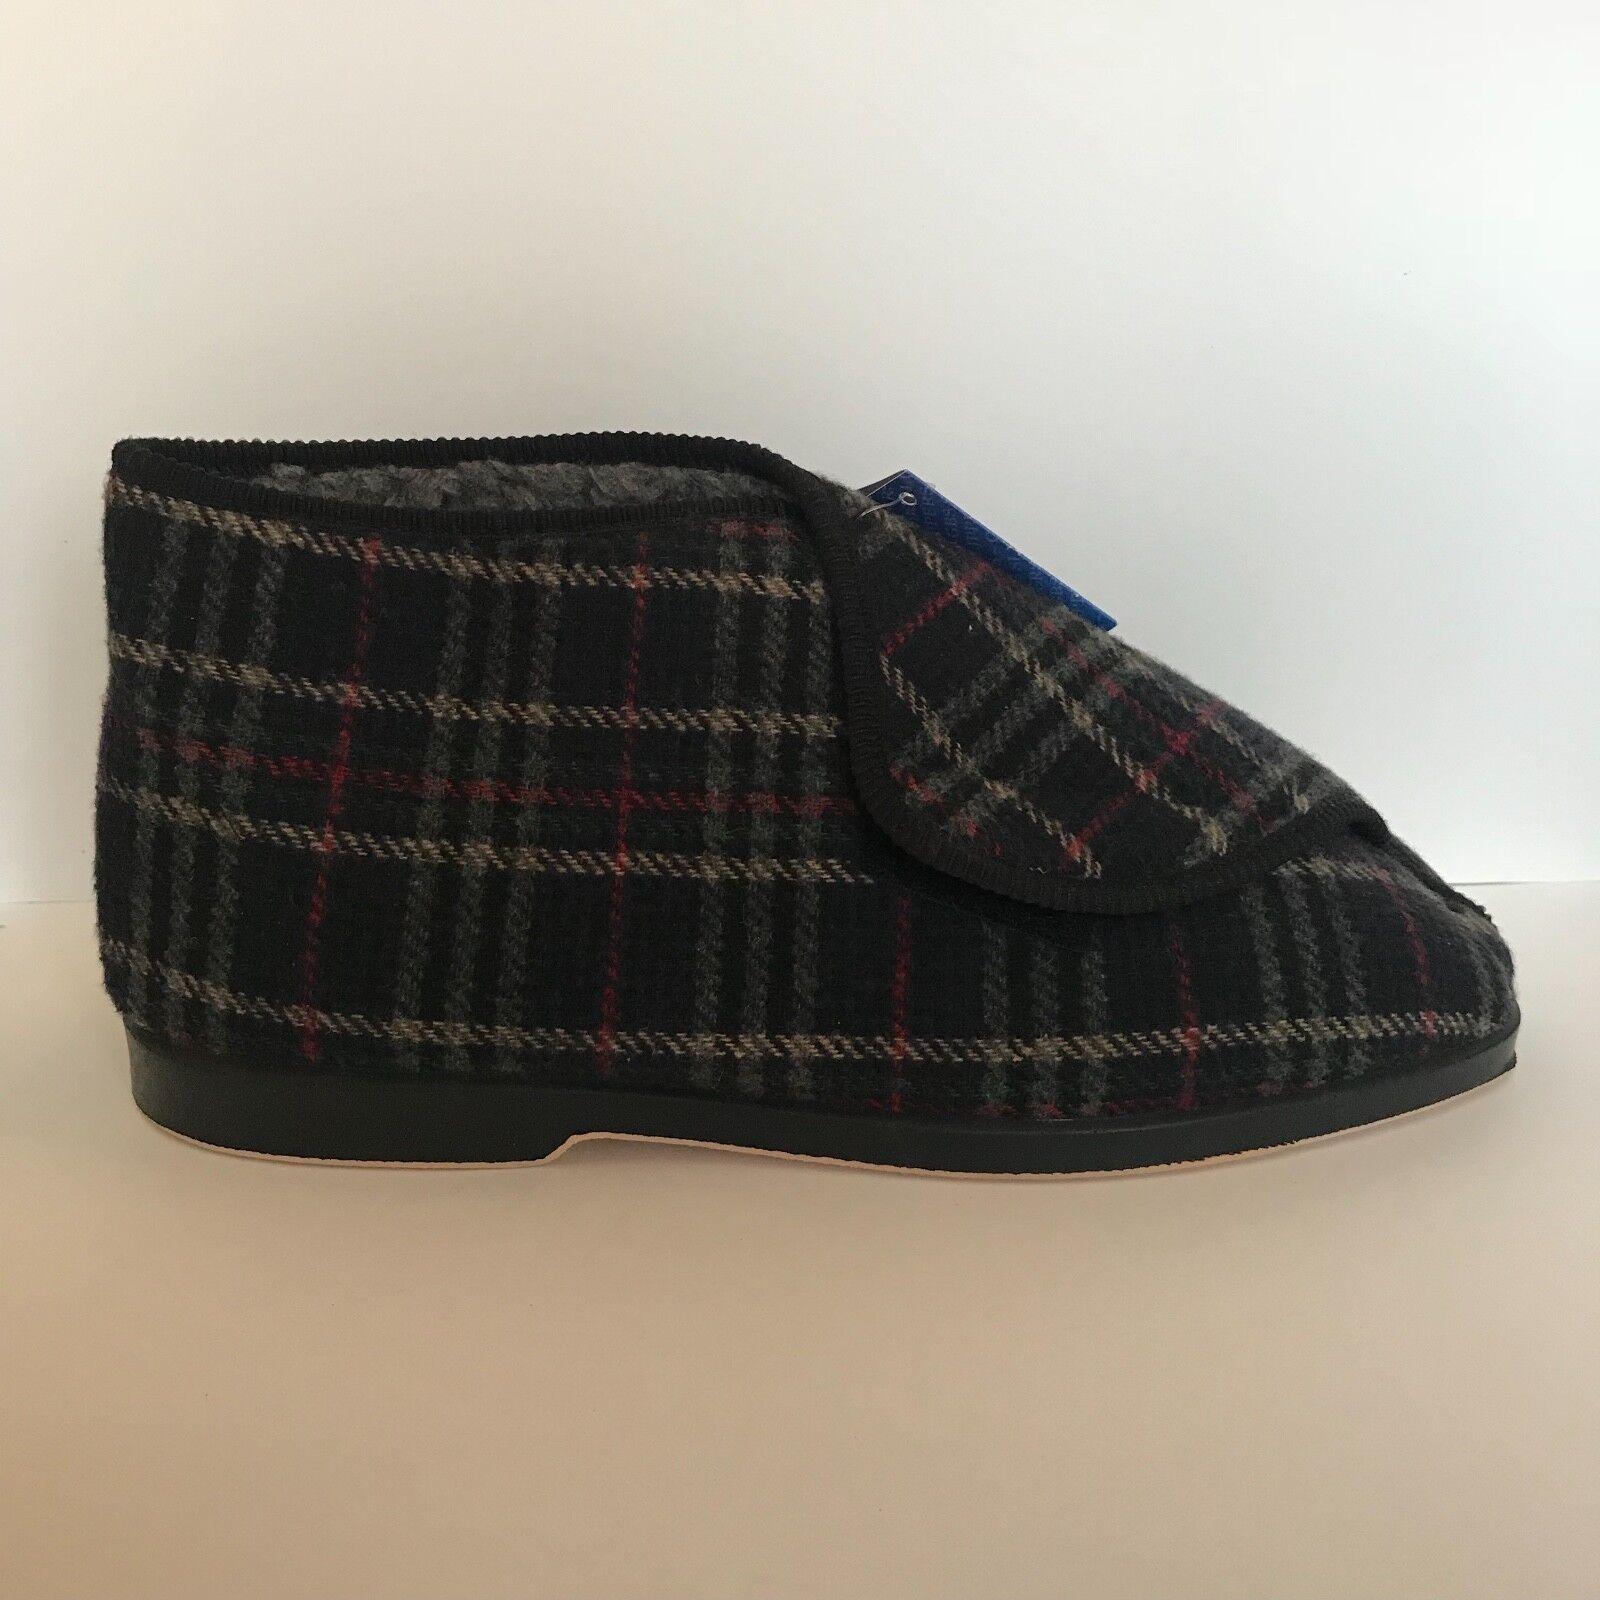 GBS William Navy bluee Check Print Velcro Comfort Boot Slippers UK 12 EU 46